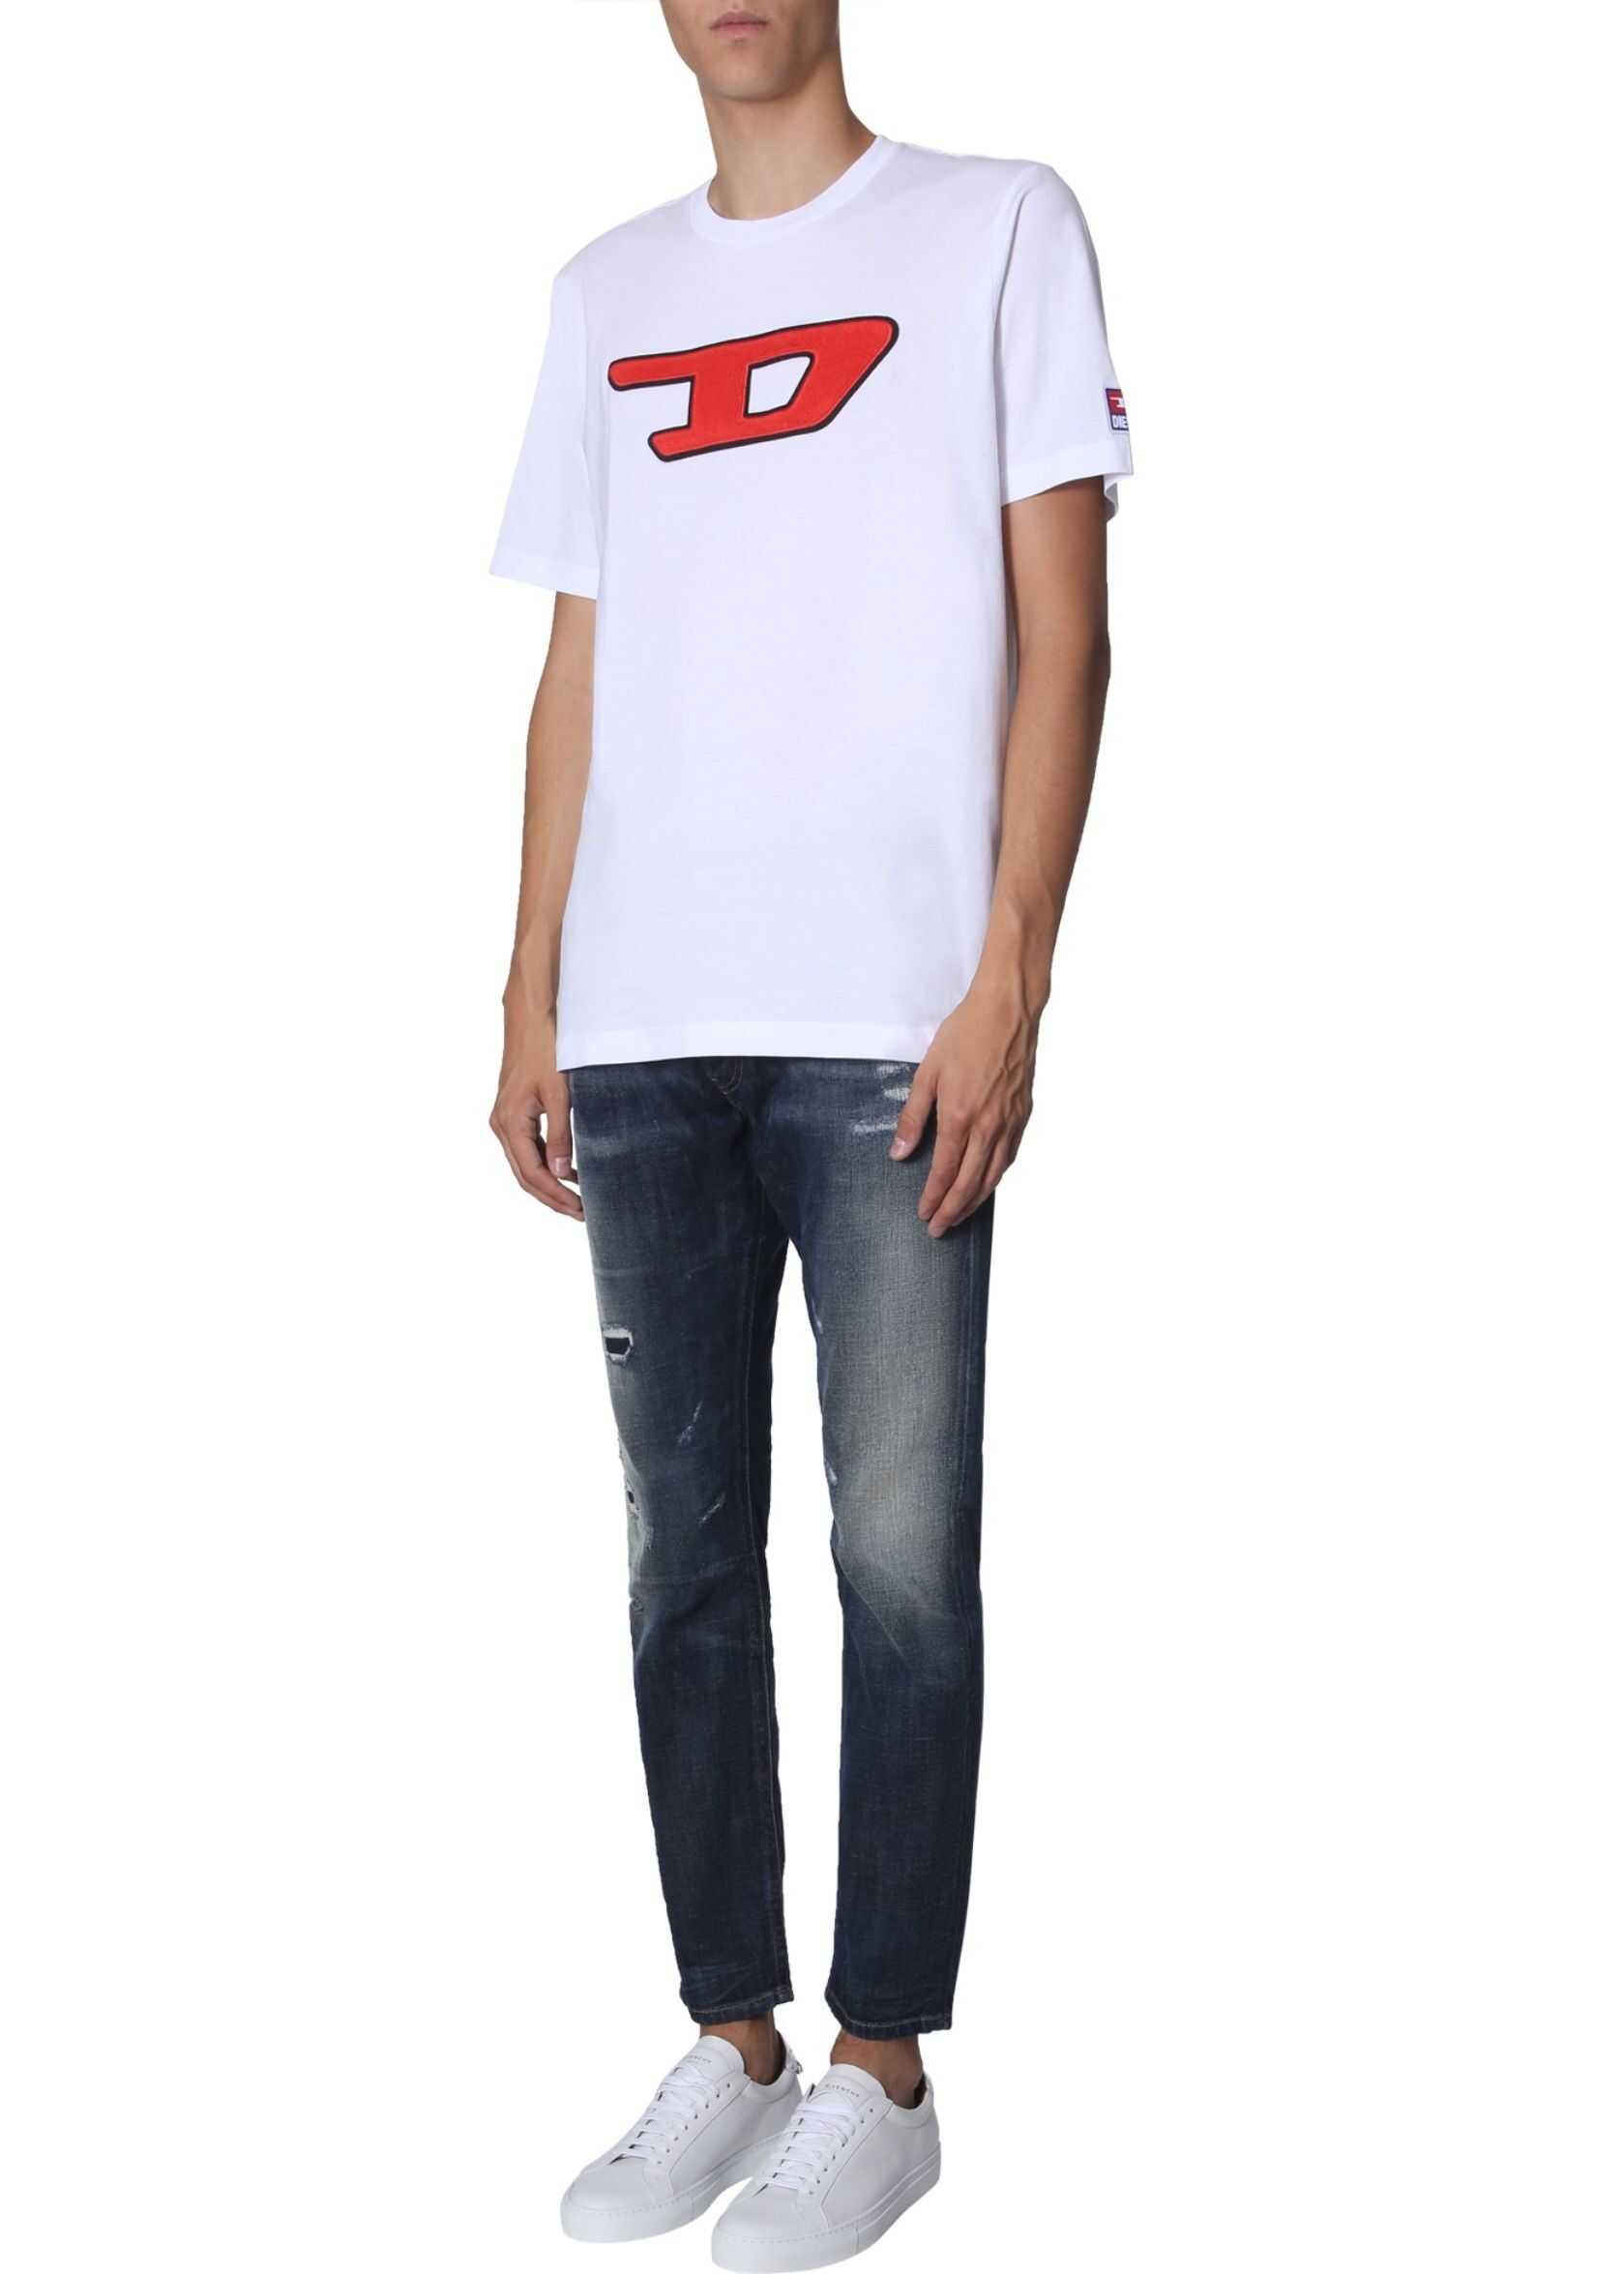 """T-Just-Division-D"" T-Shirt"